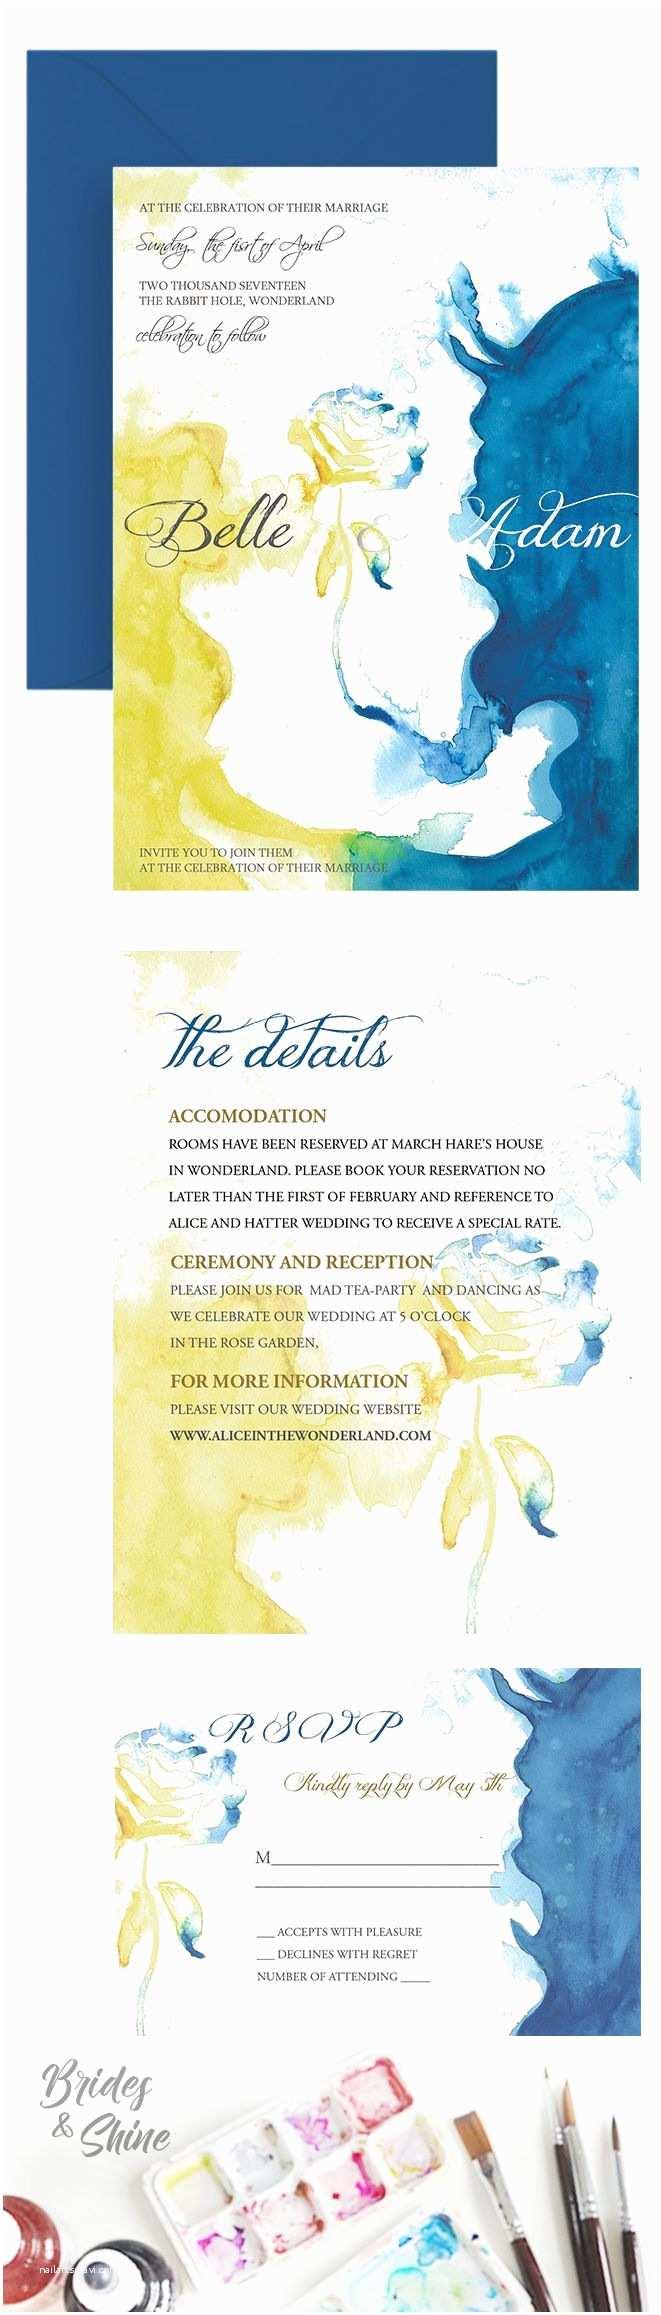 Disney themed Wedding Invitations 25 Best Ideas About Disney Wedding Invitations On